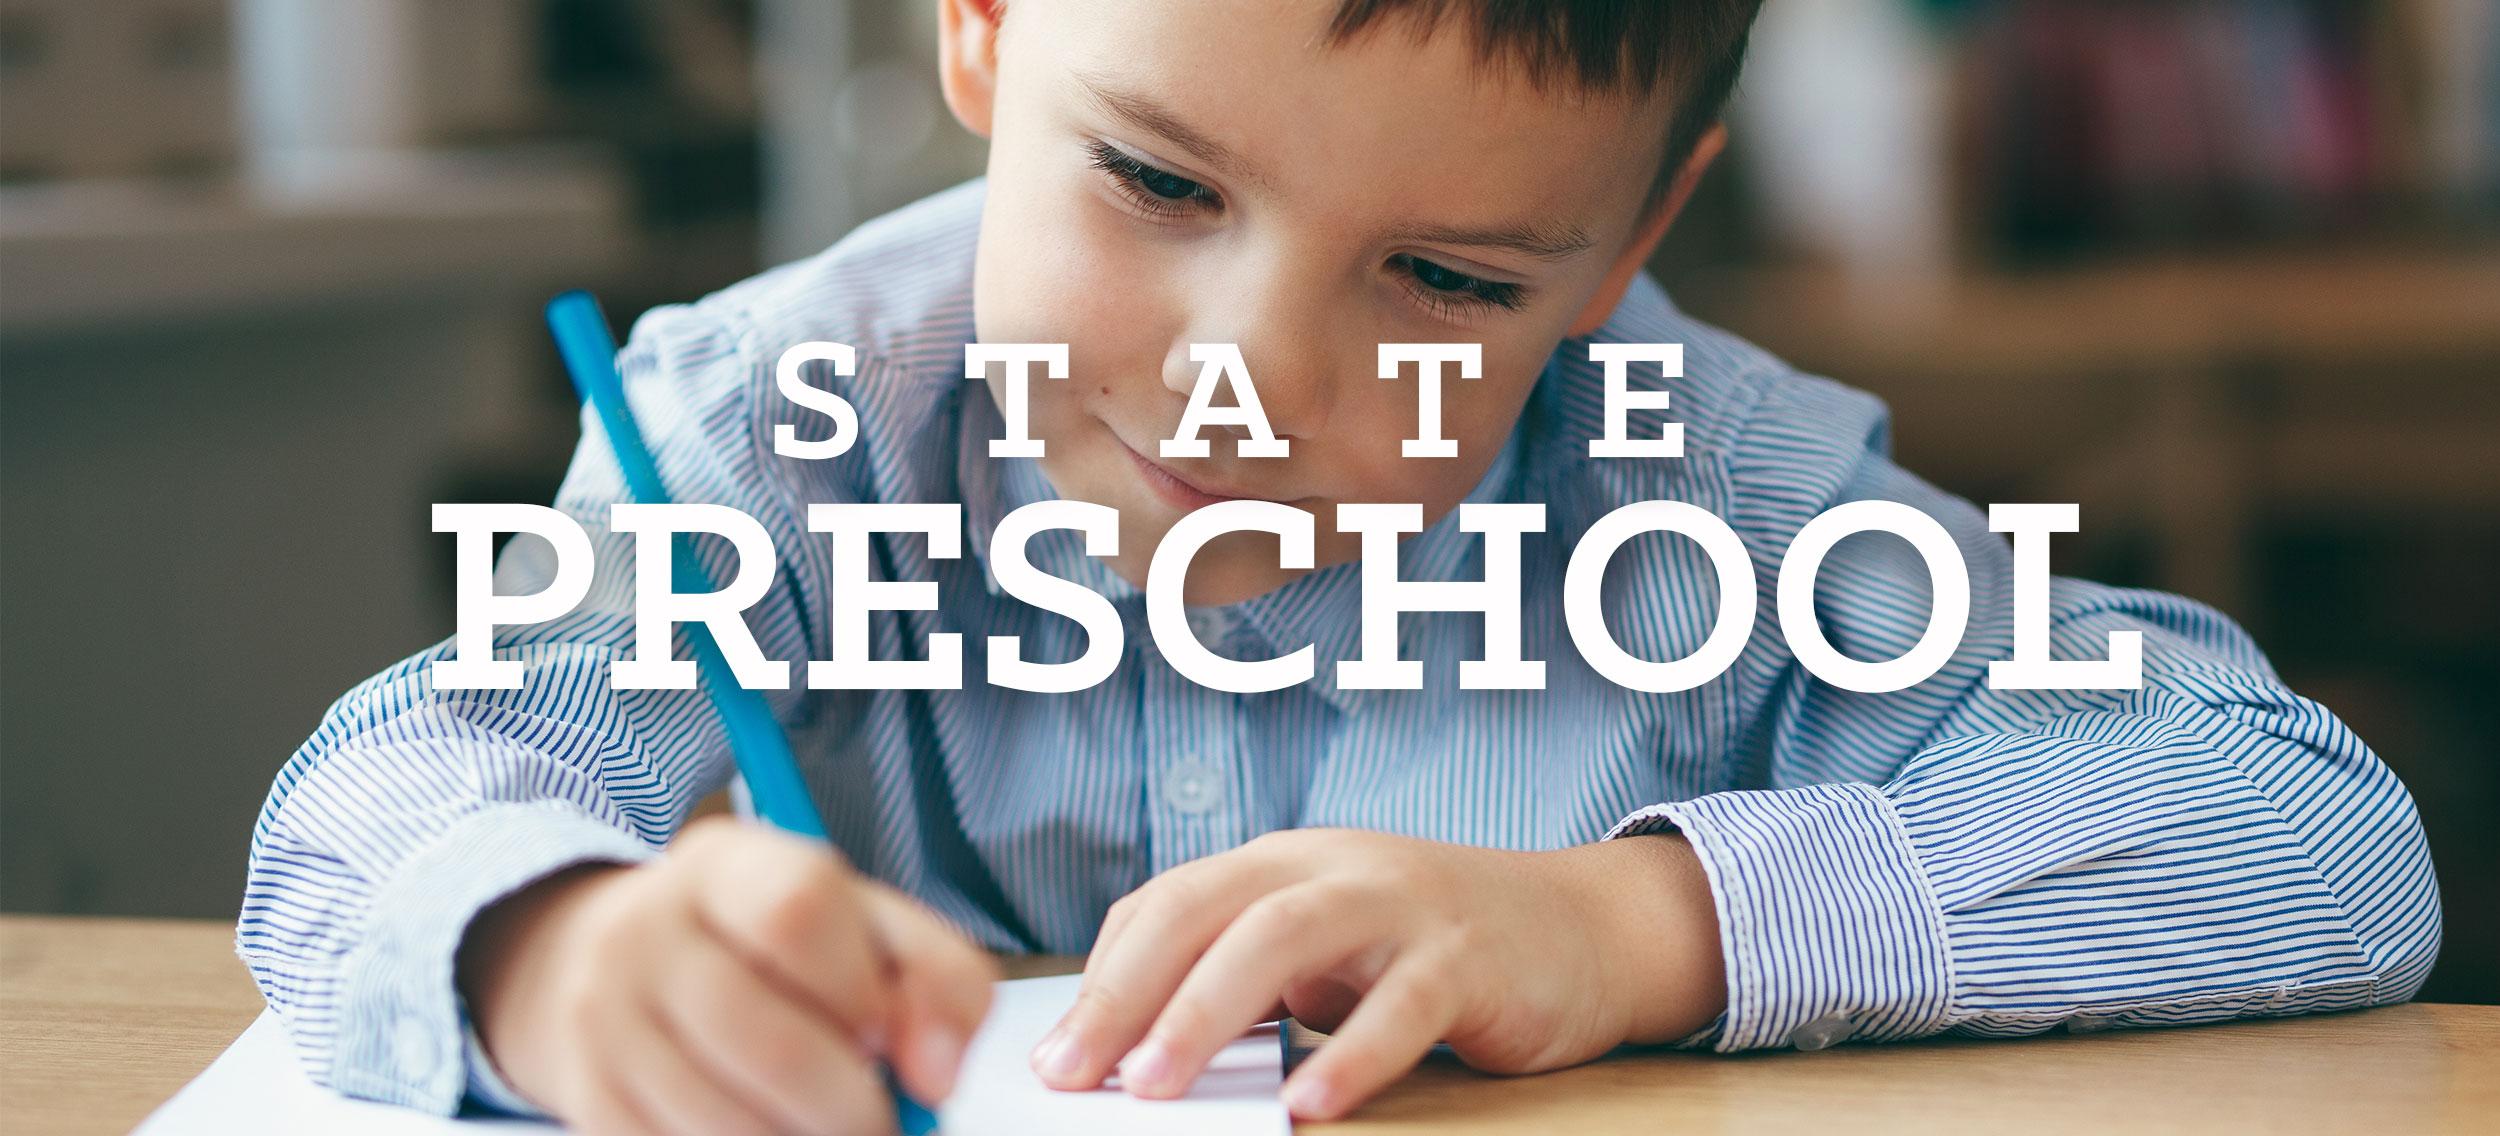 statepreschool_header.jpg